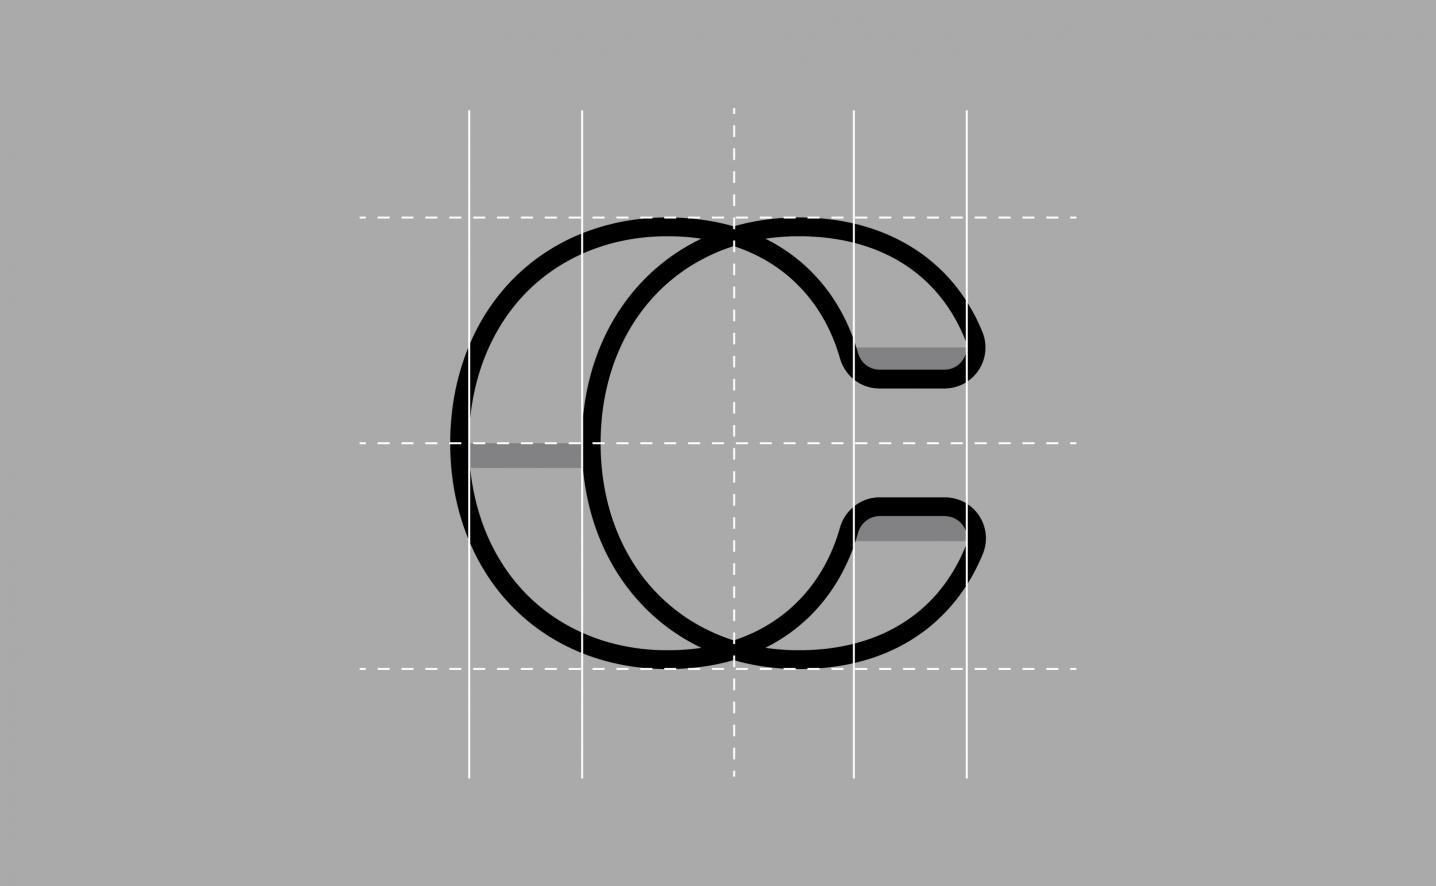 logo-design-crix-capital-london-03